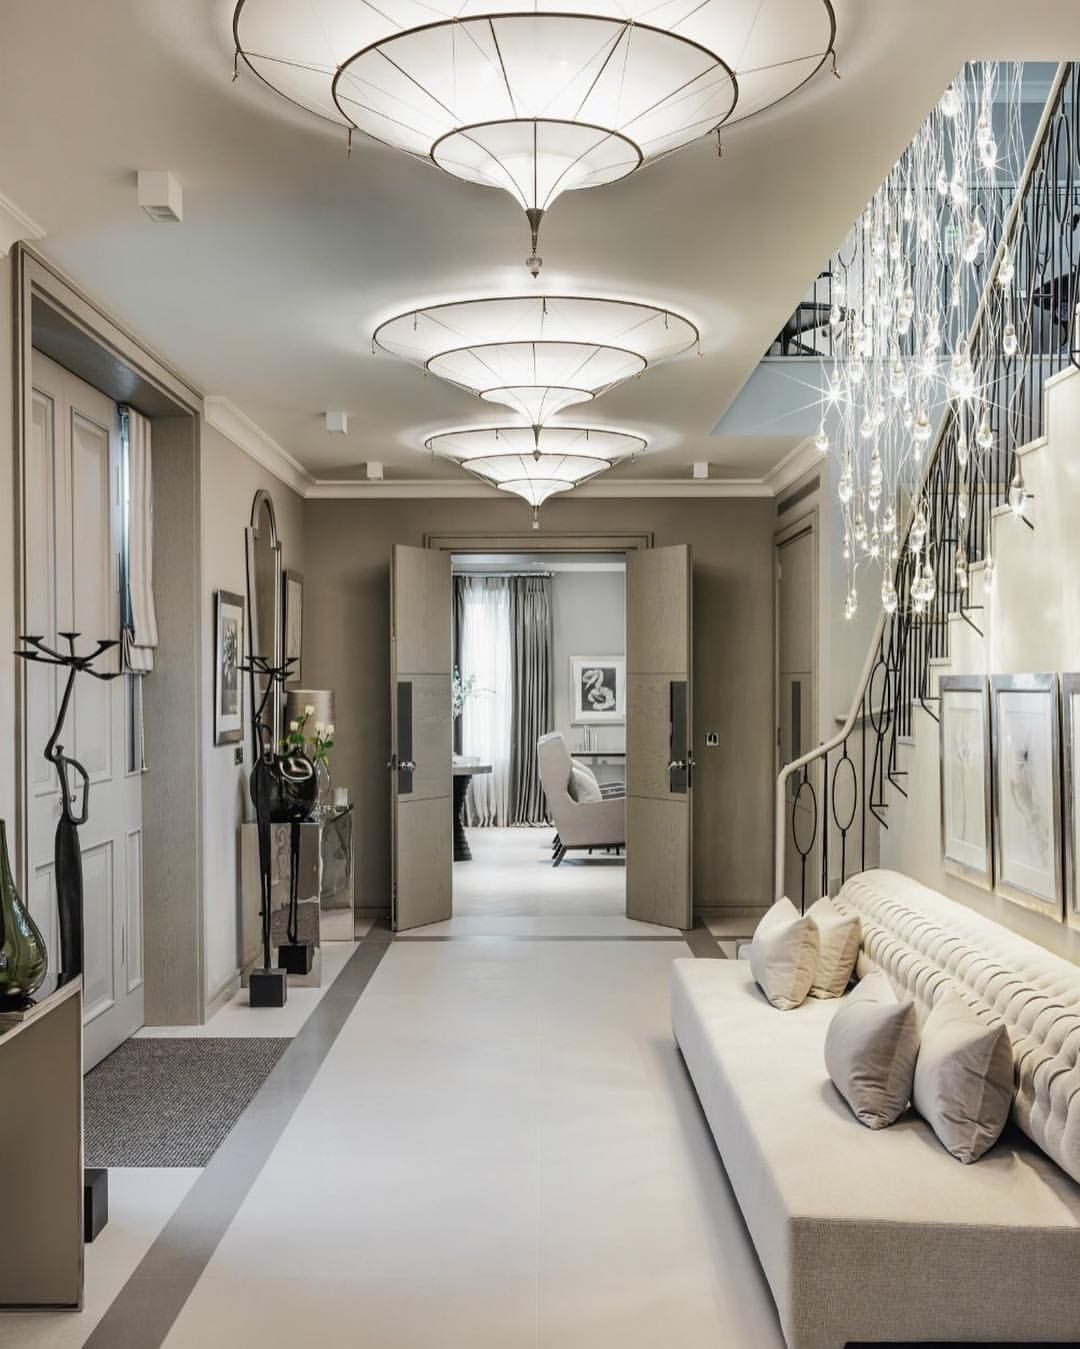 Entryway decor foyer lighting modern bench ideas also best luxury interior design group images in living room rh pinterest